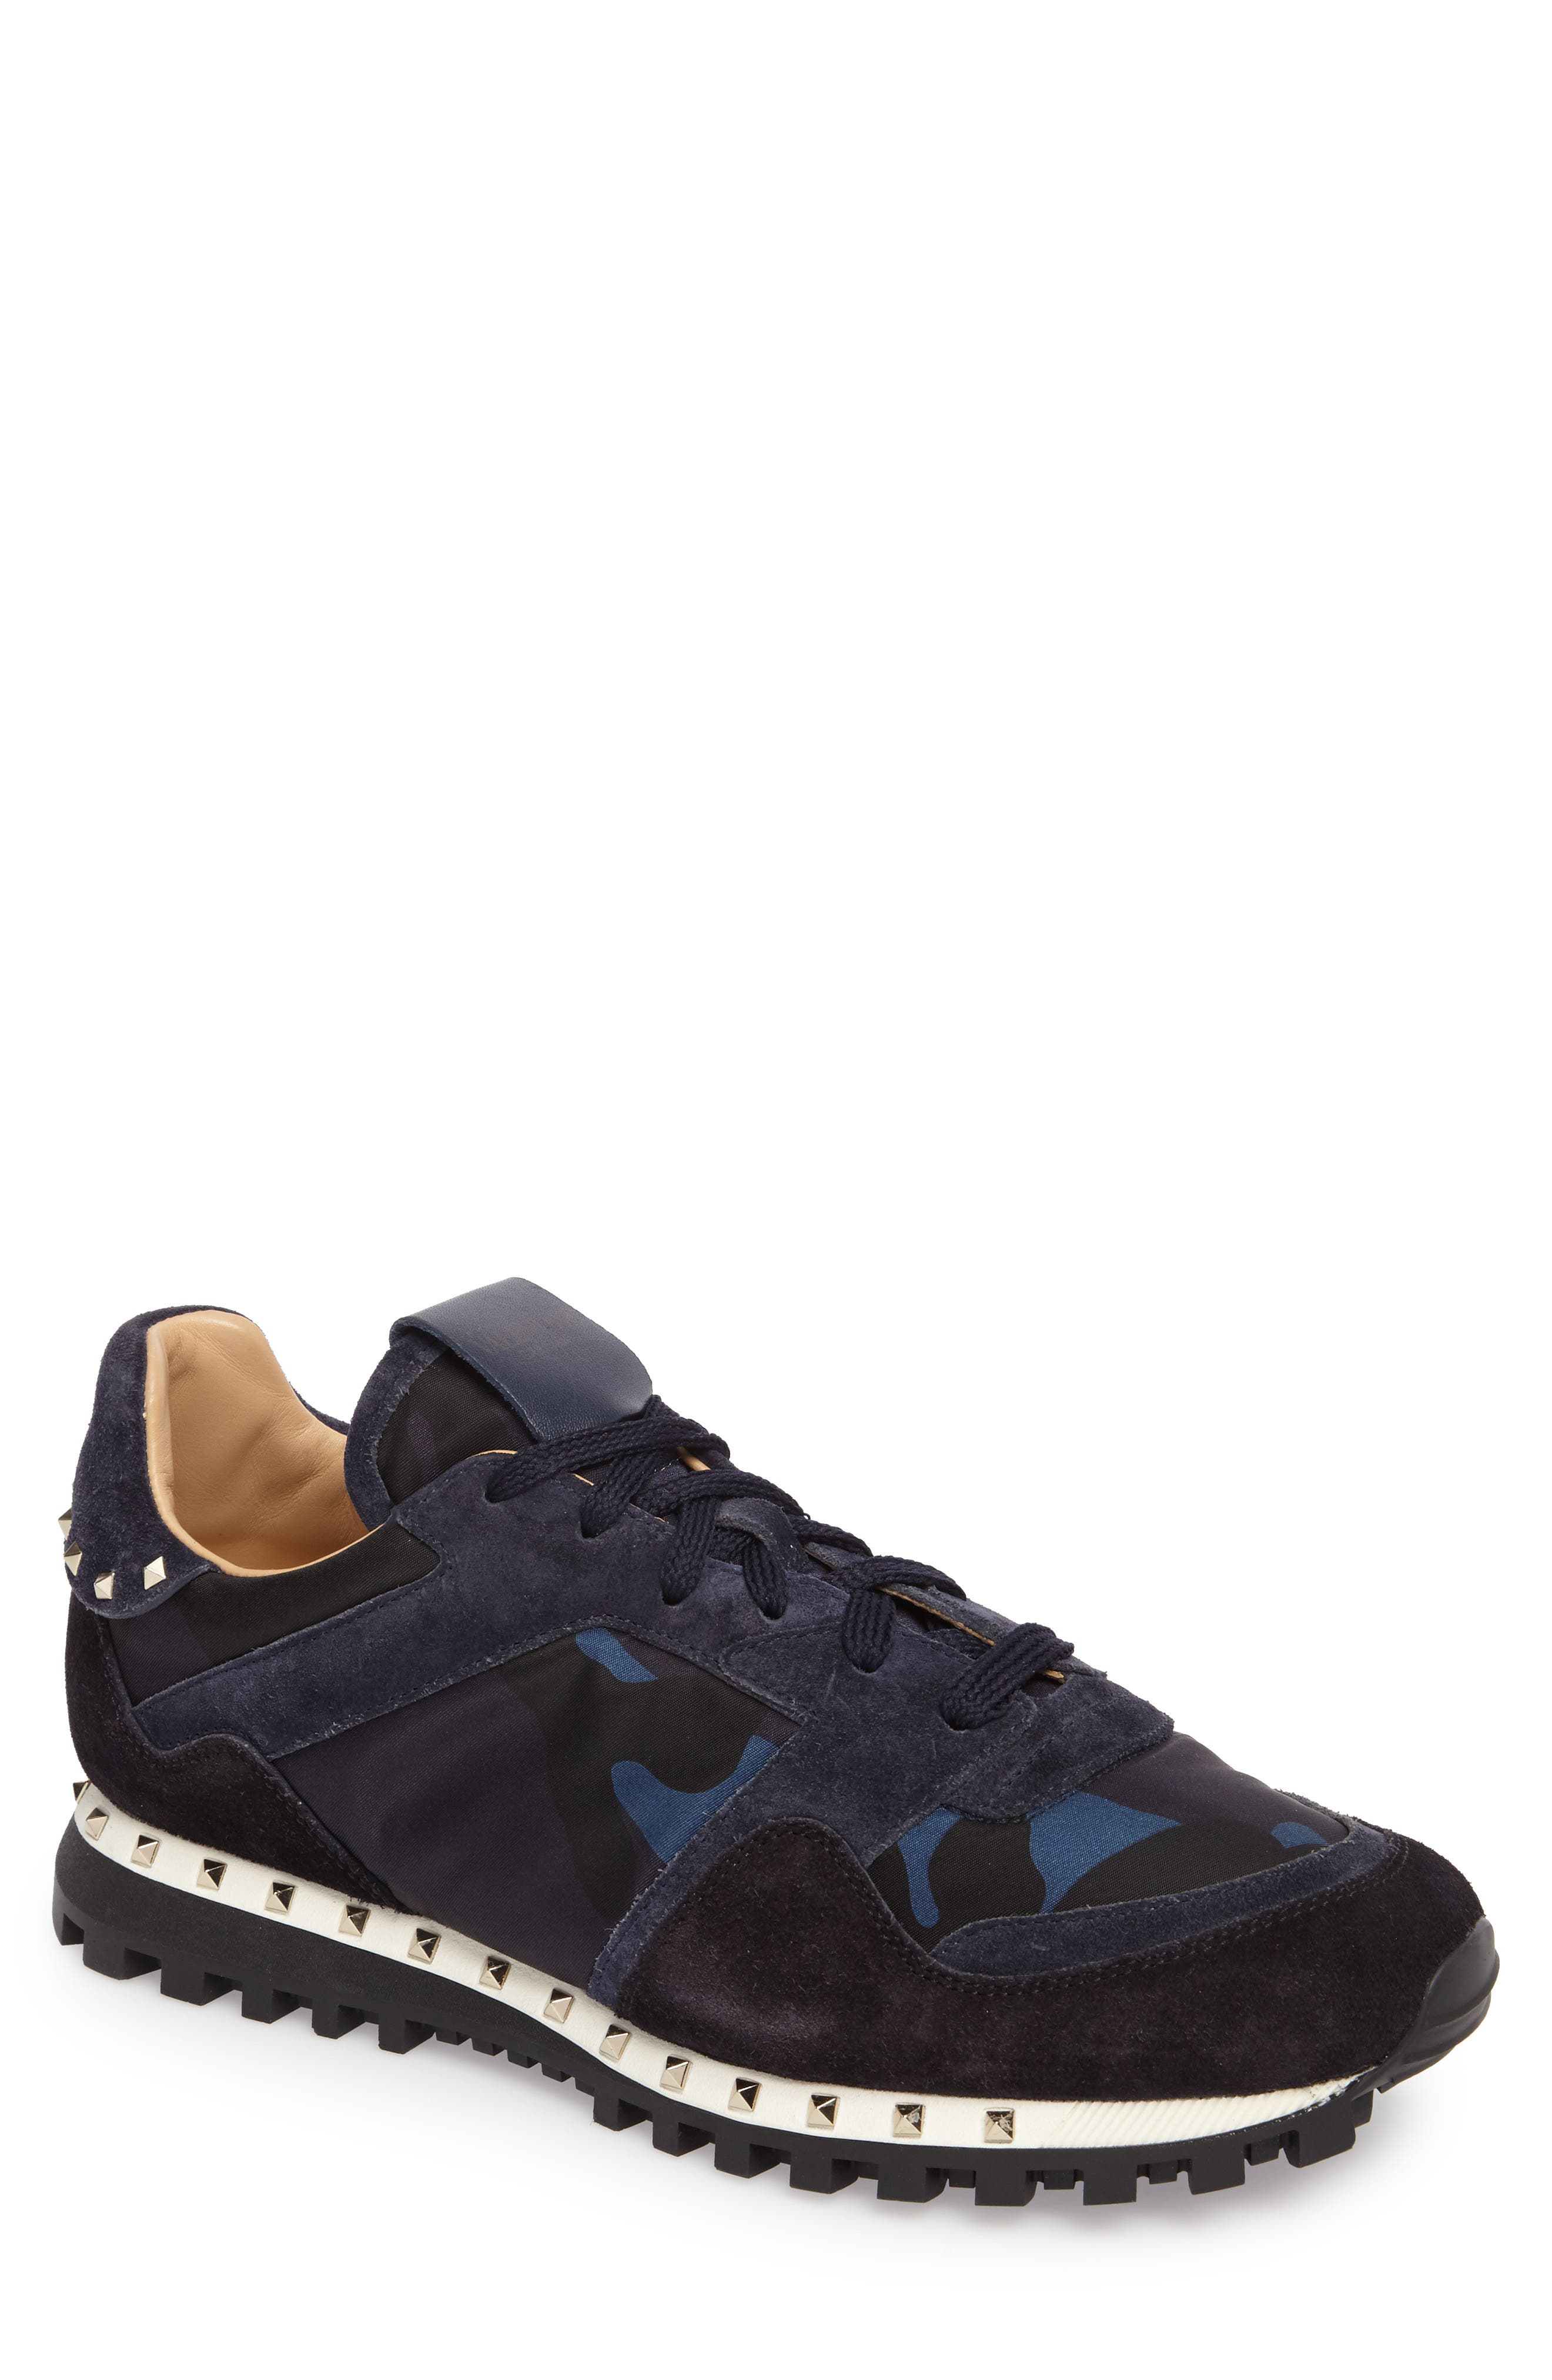 Camo Rockstud Sneaker,                         Main,                         color, Marine/ Nero/ Dark Blue